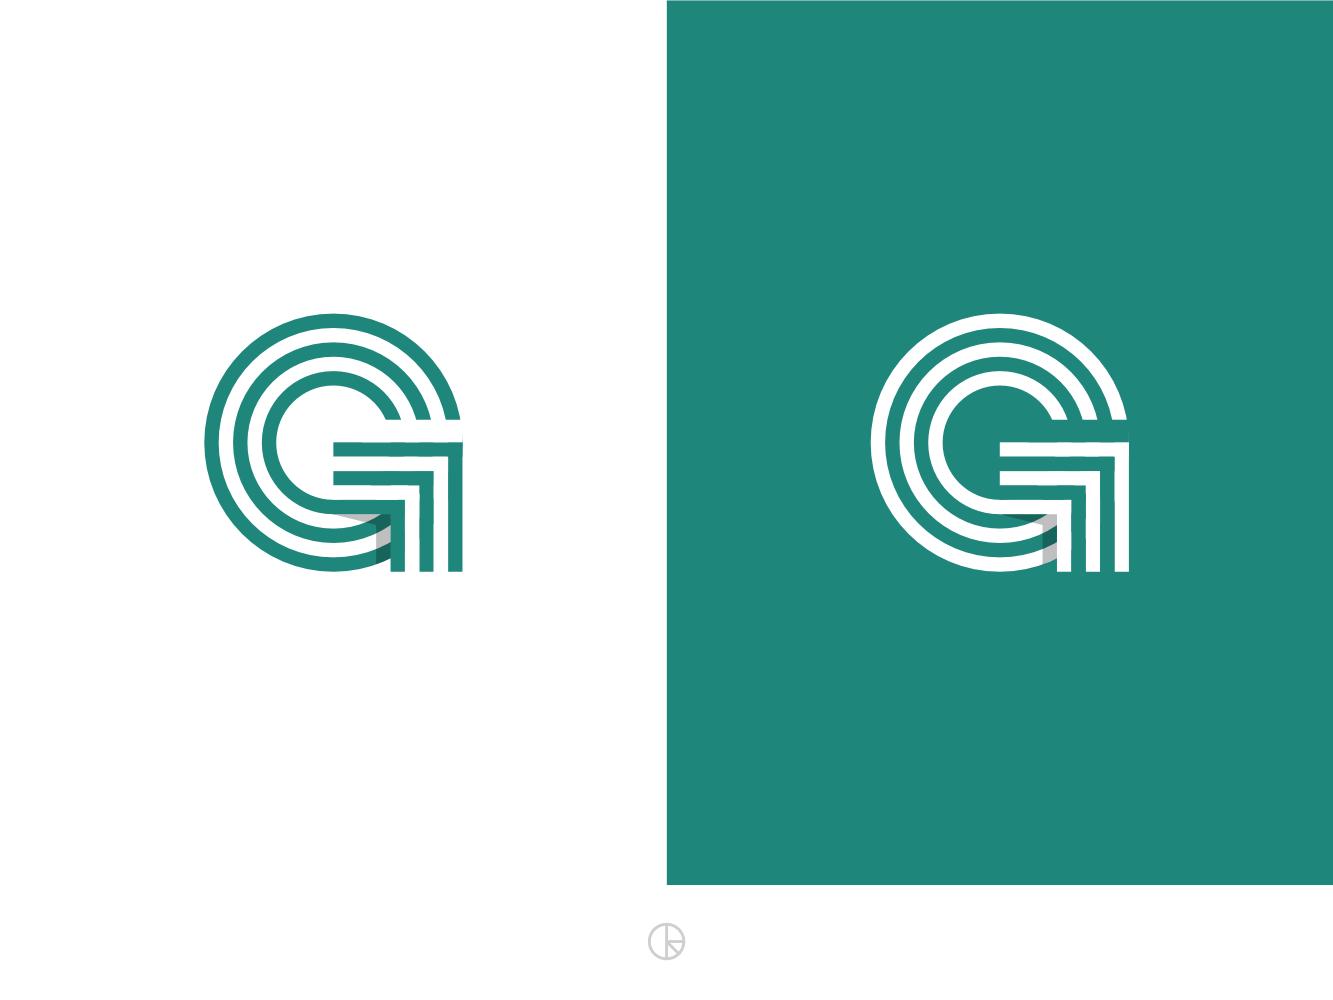 G 3 dribbble